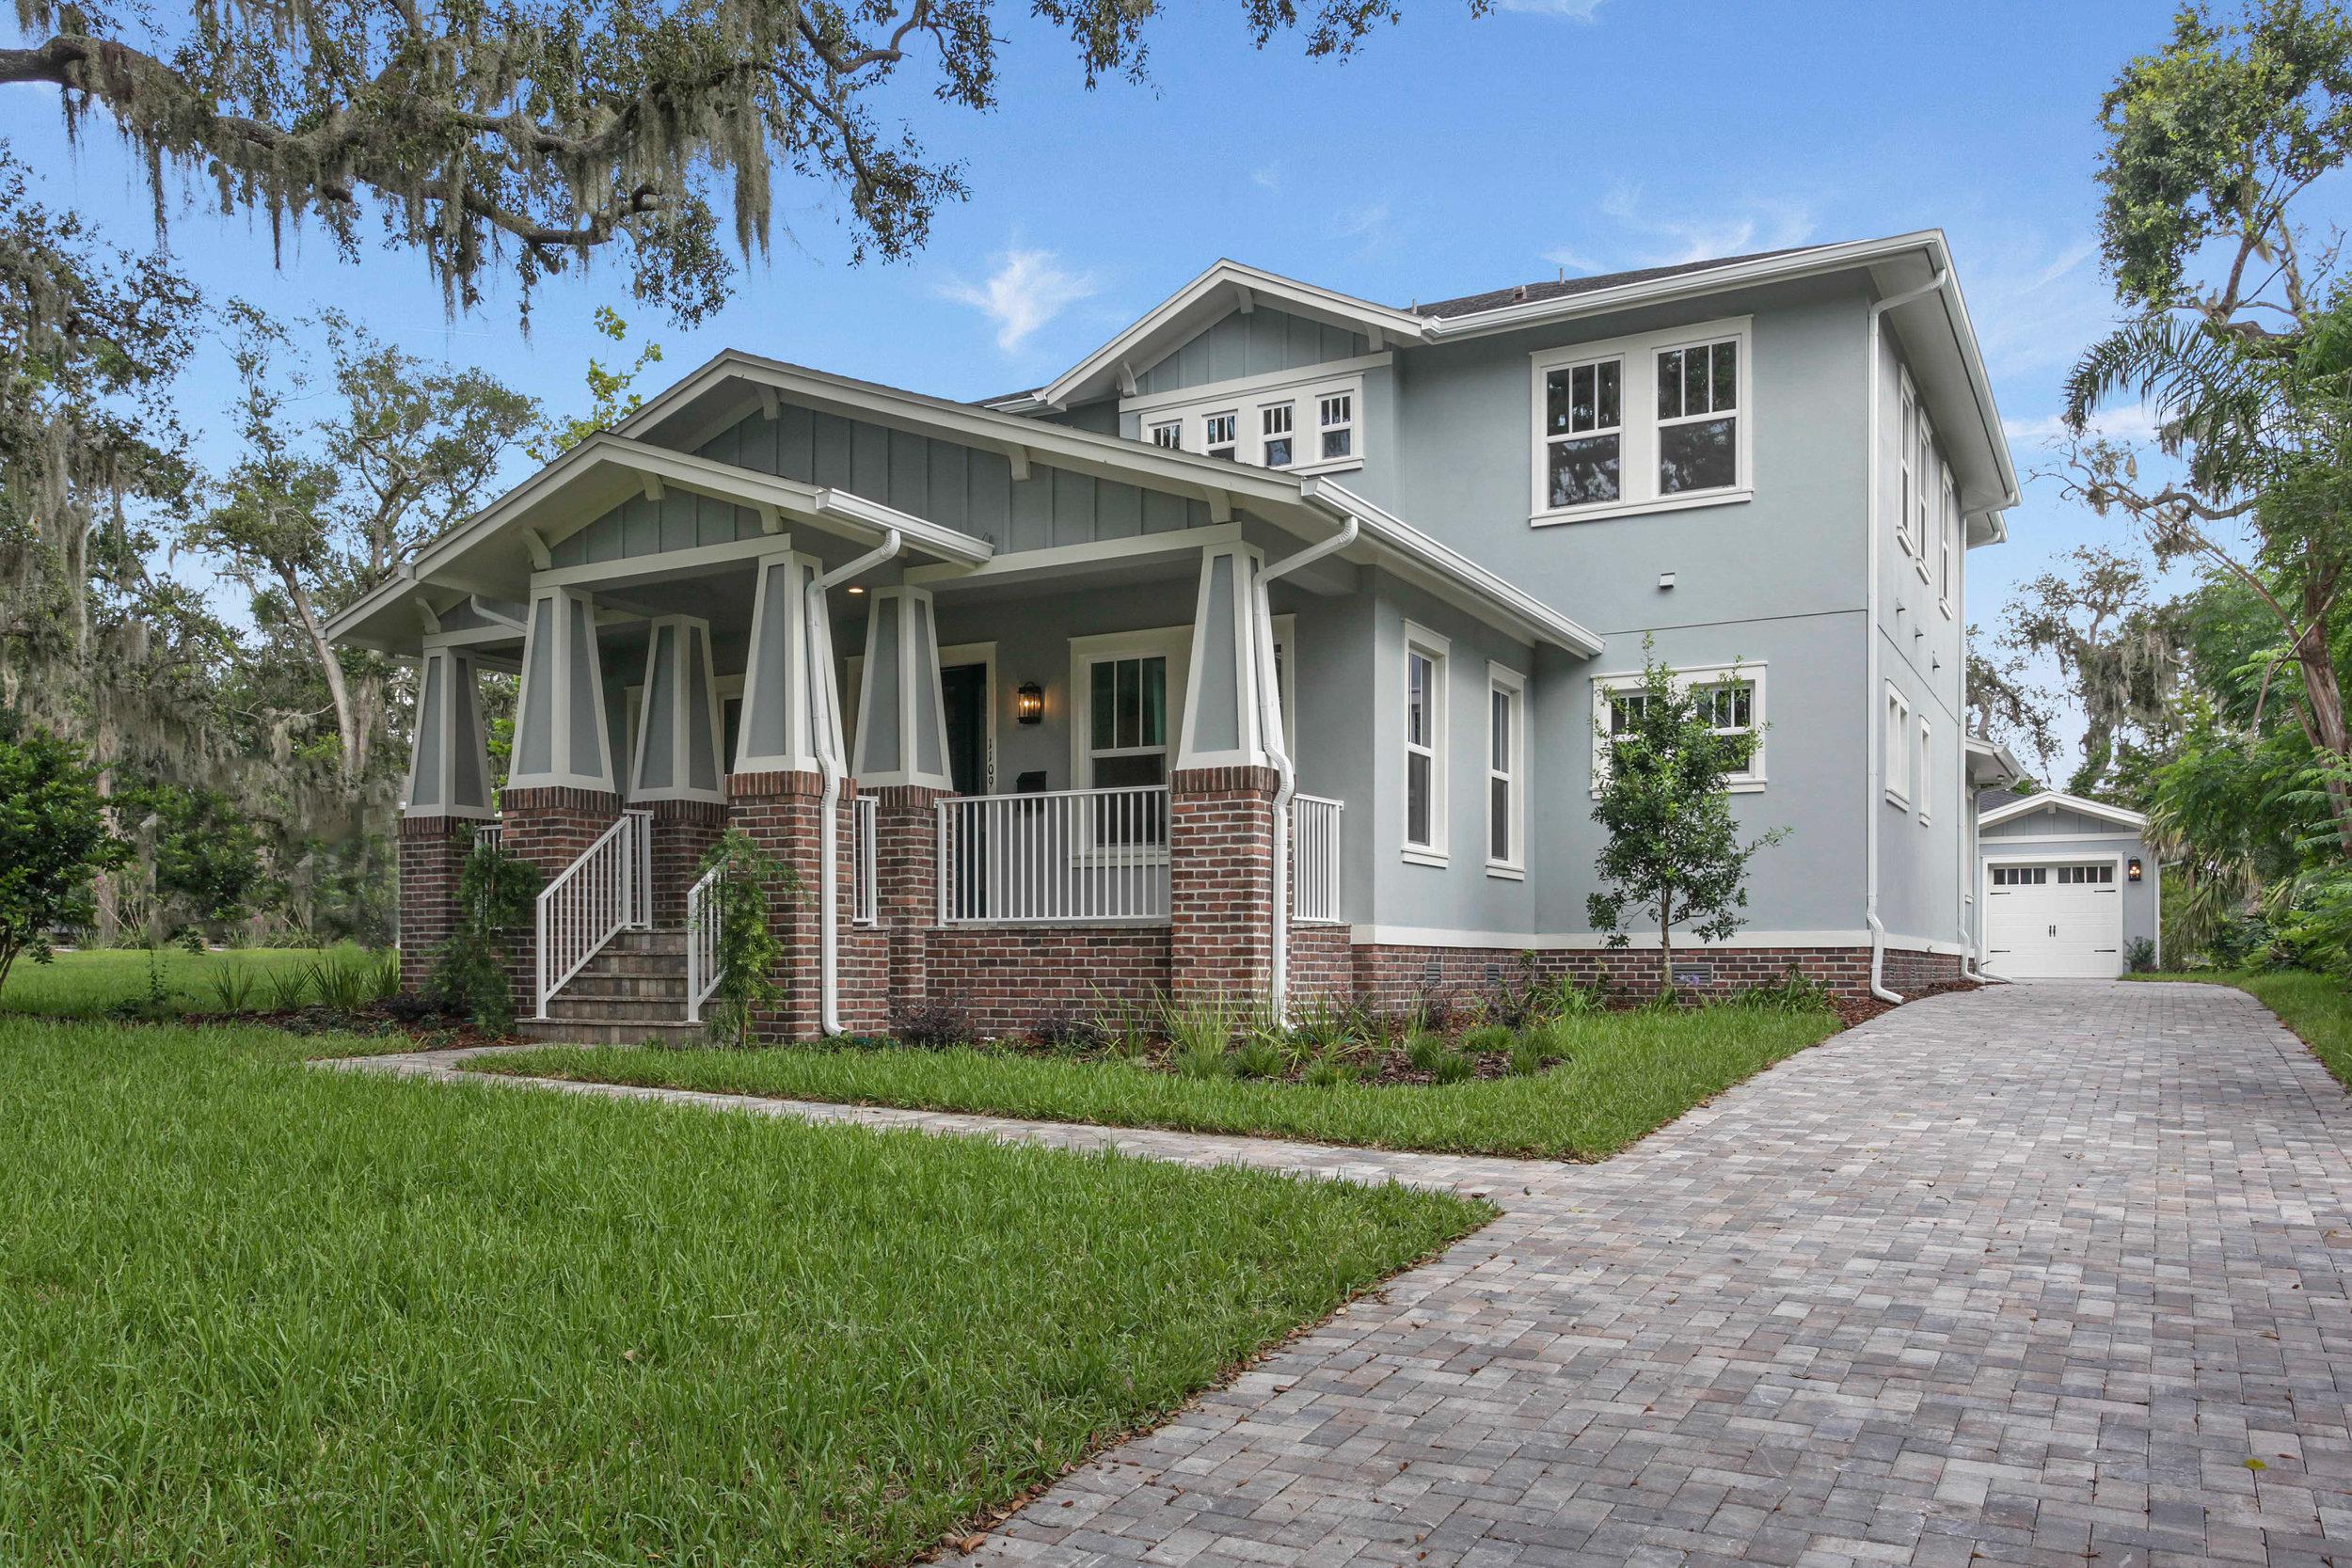 1109 E Jackson St, Orlando_IMG_1235.jpg